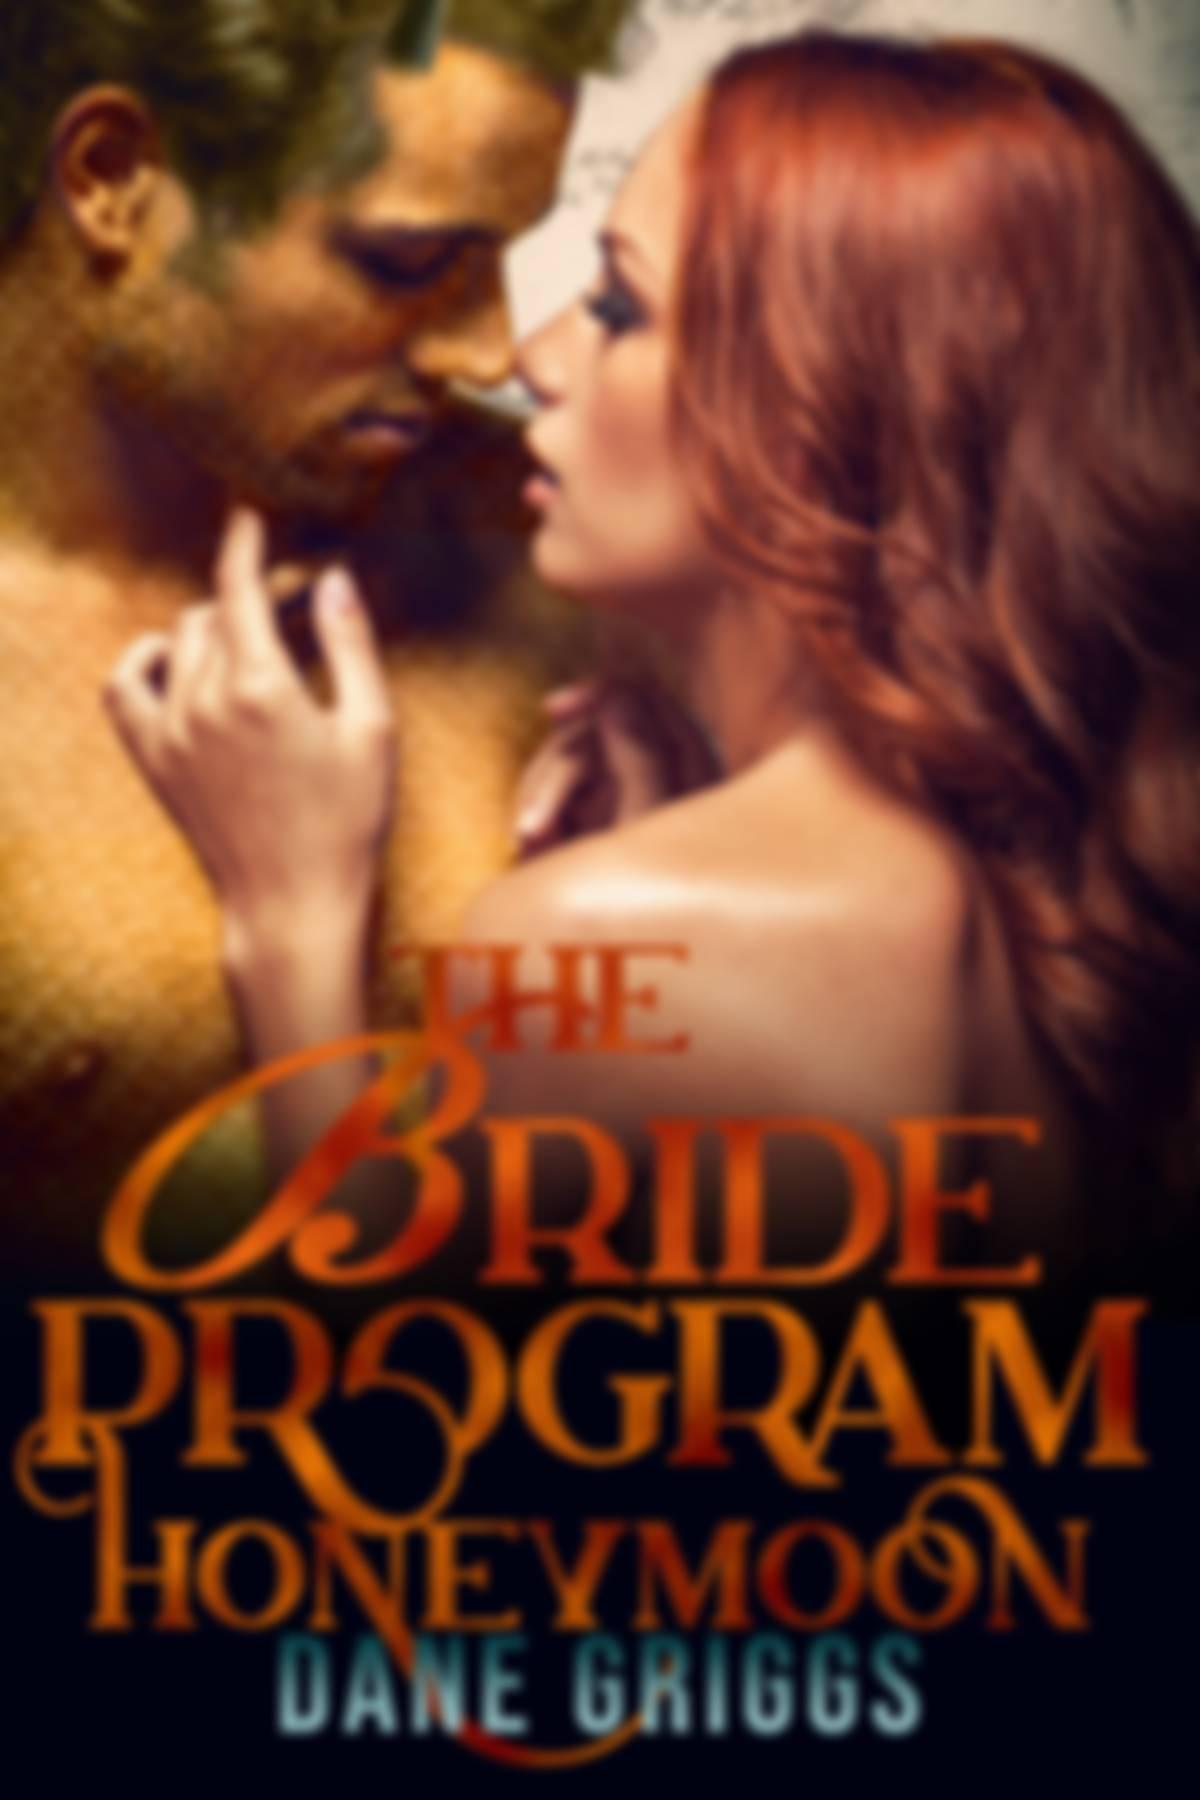 The Bride Program Honeymoon book cover